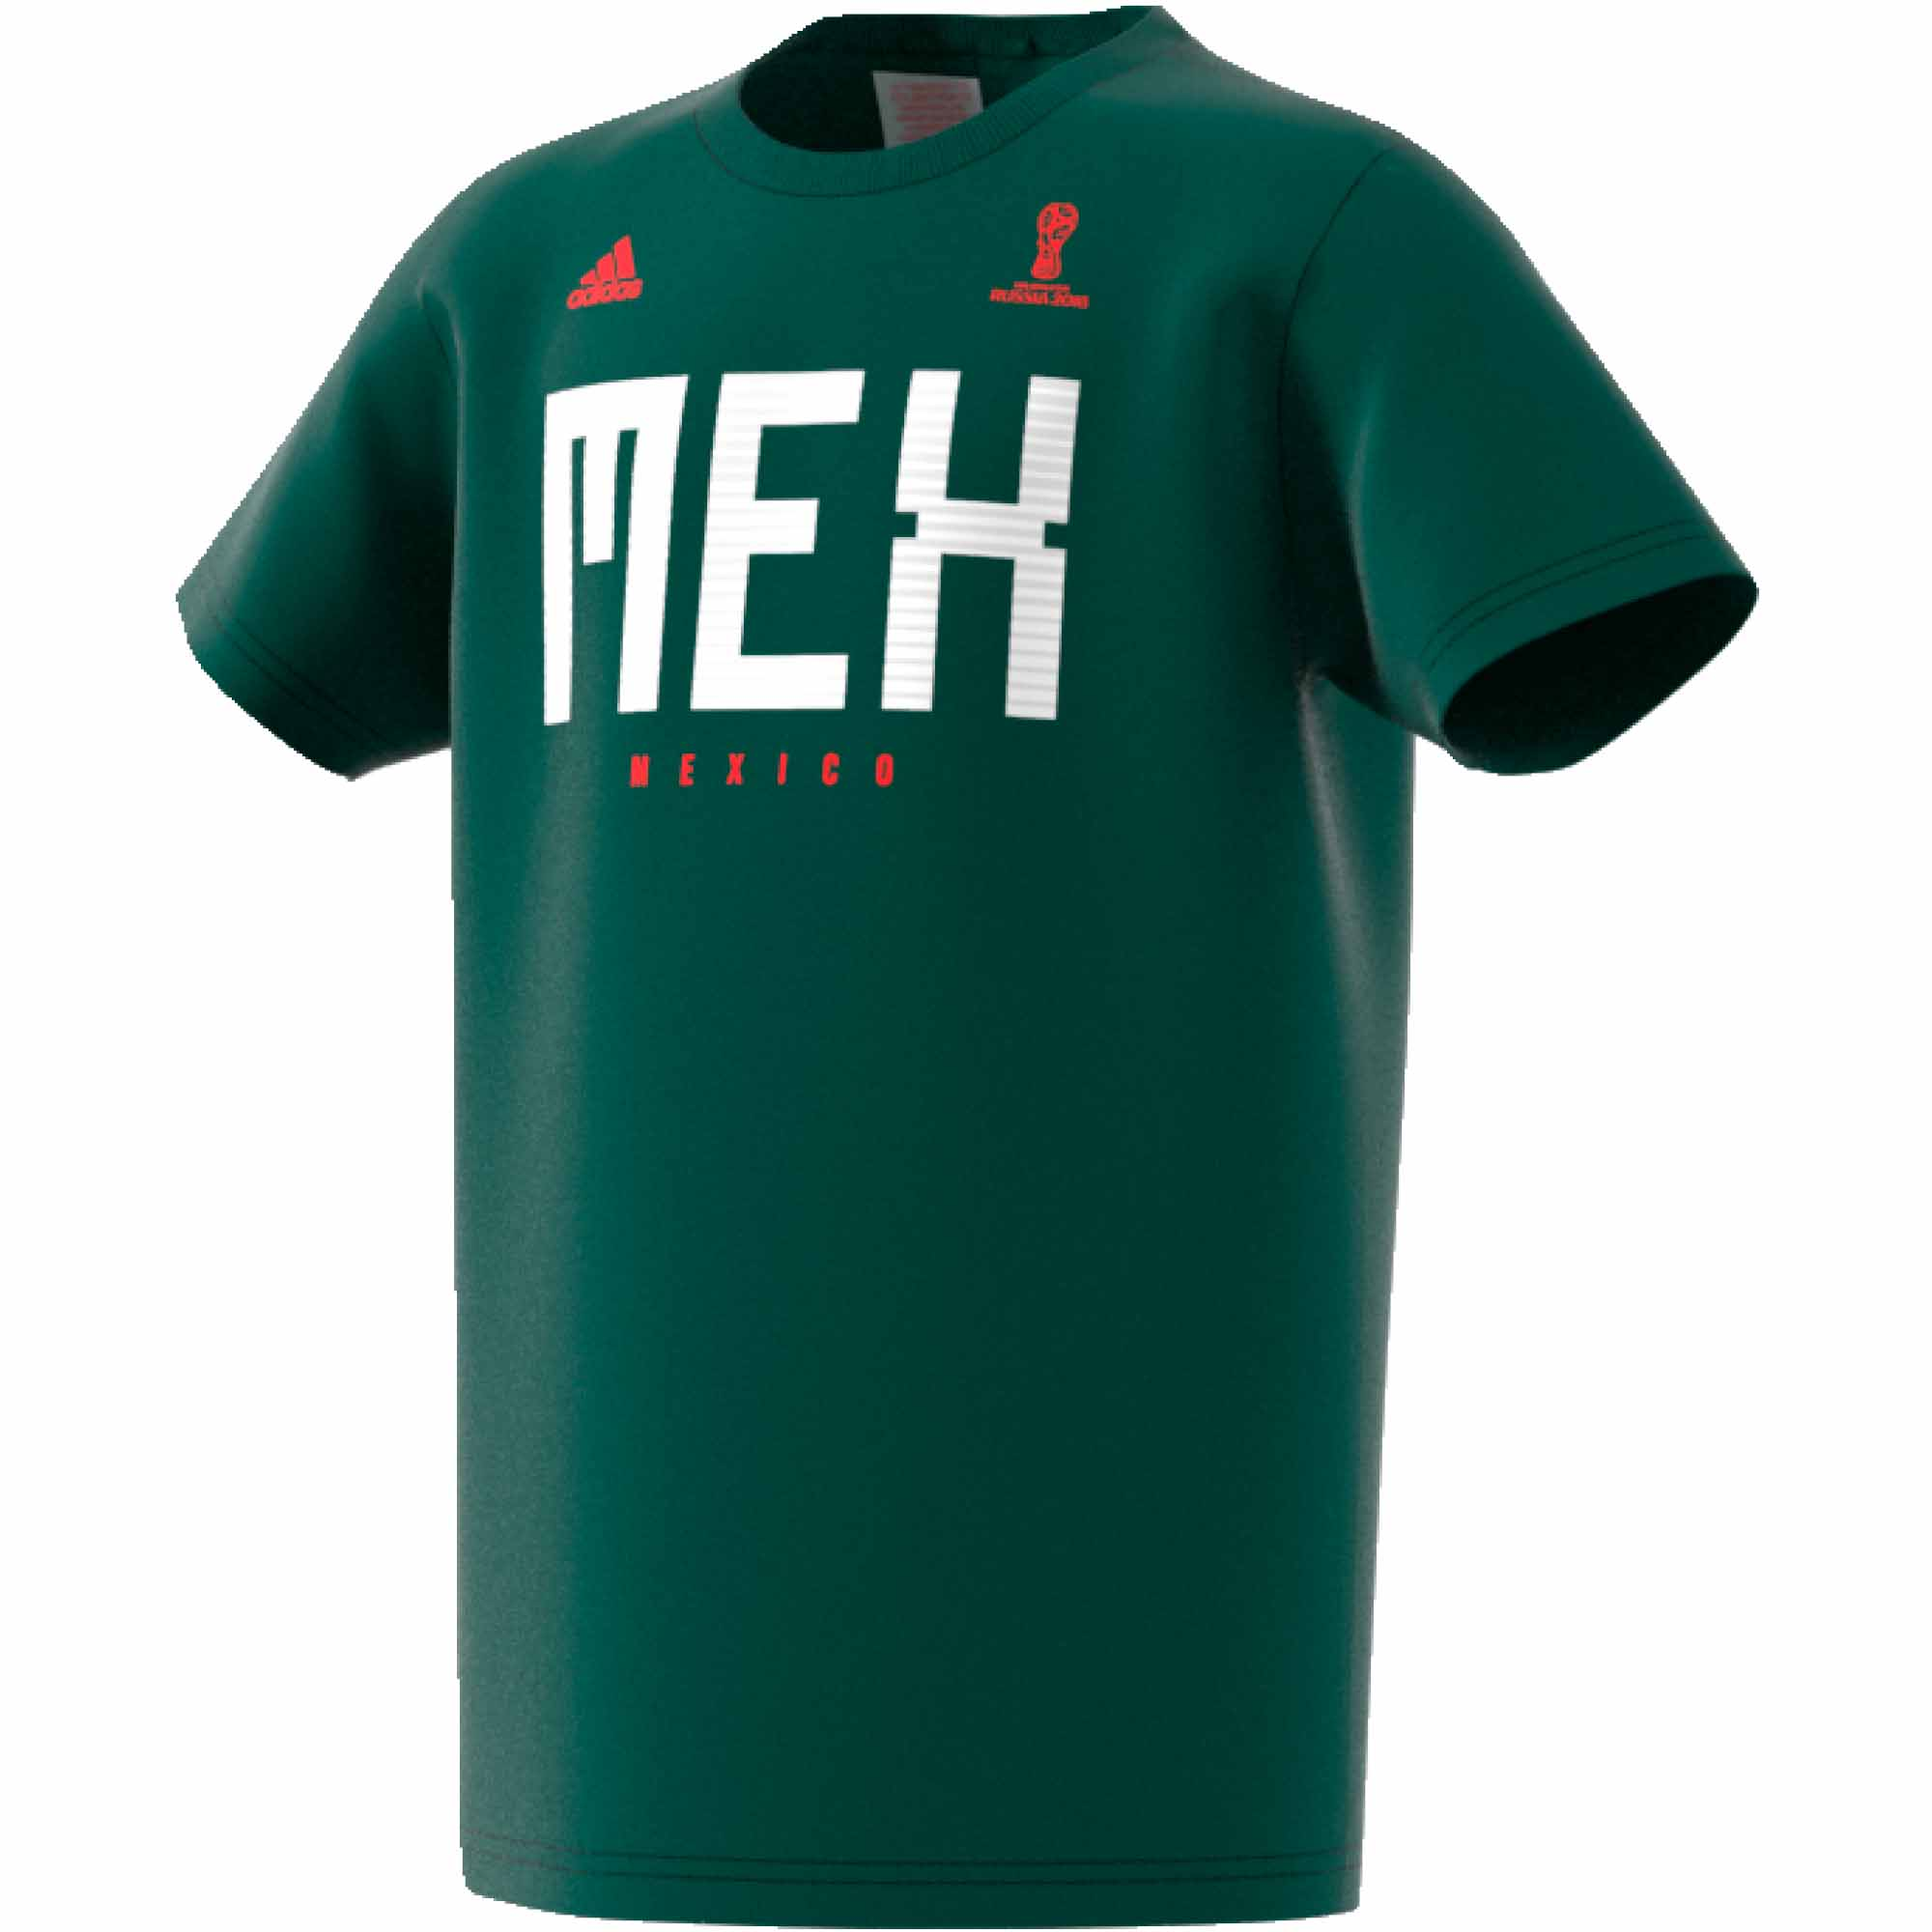 f865f40f7 adidas Mexico Tee - Youth - Collegiate Green - SoccerPro